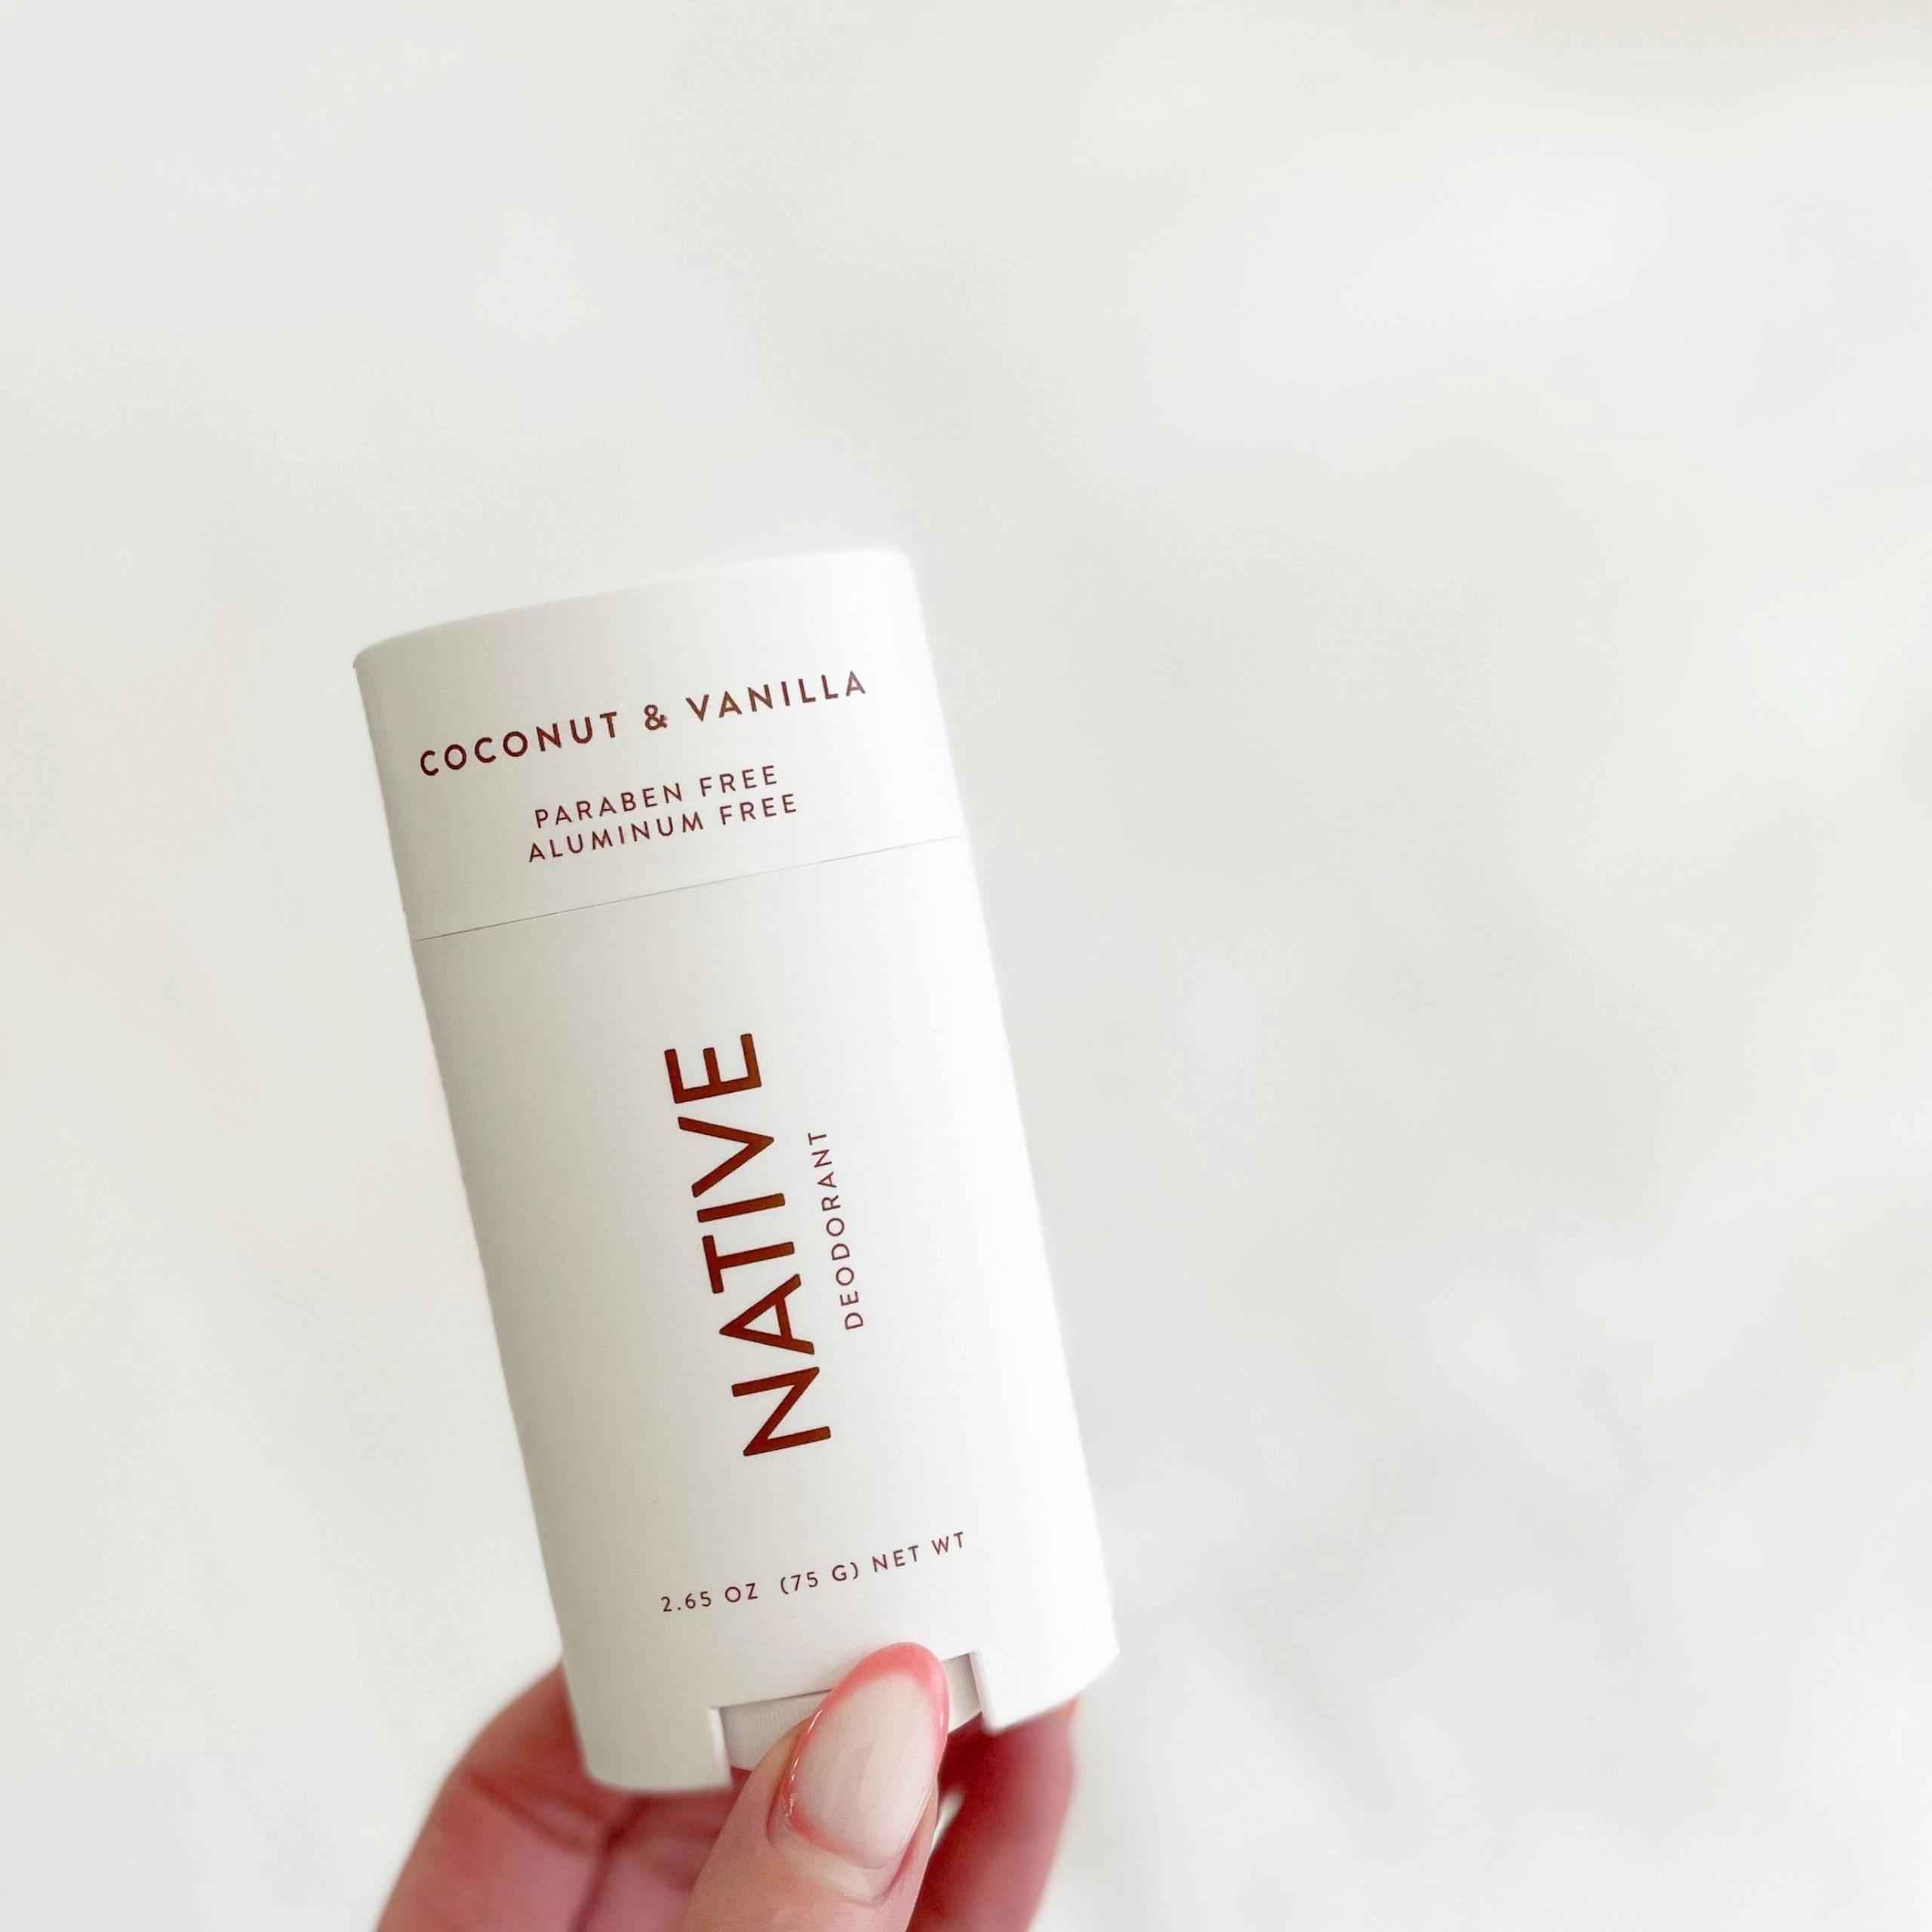 Native Natural Deodorant, Coconut and Vanilla, Aluminum Free, 2.65 Oz